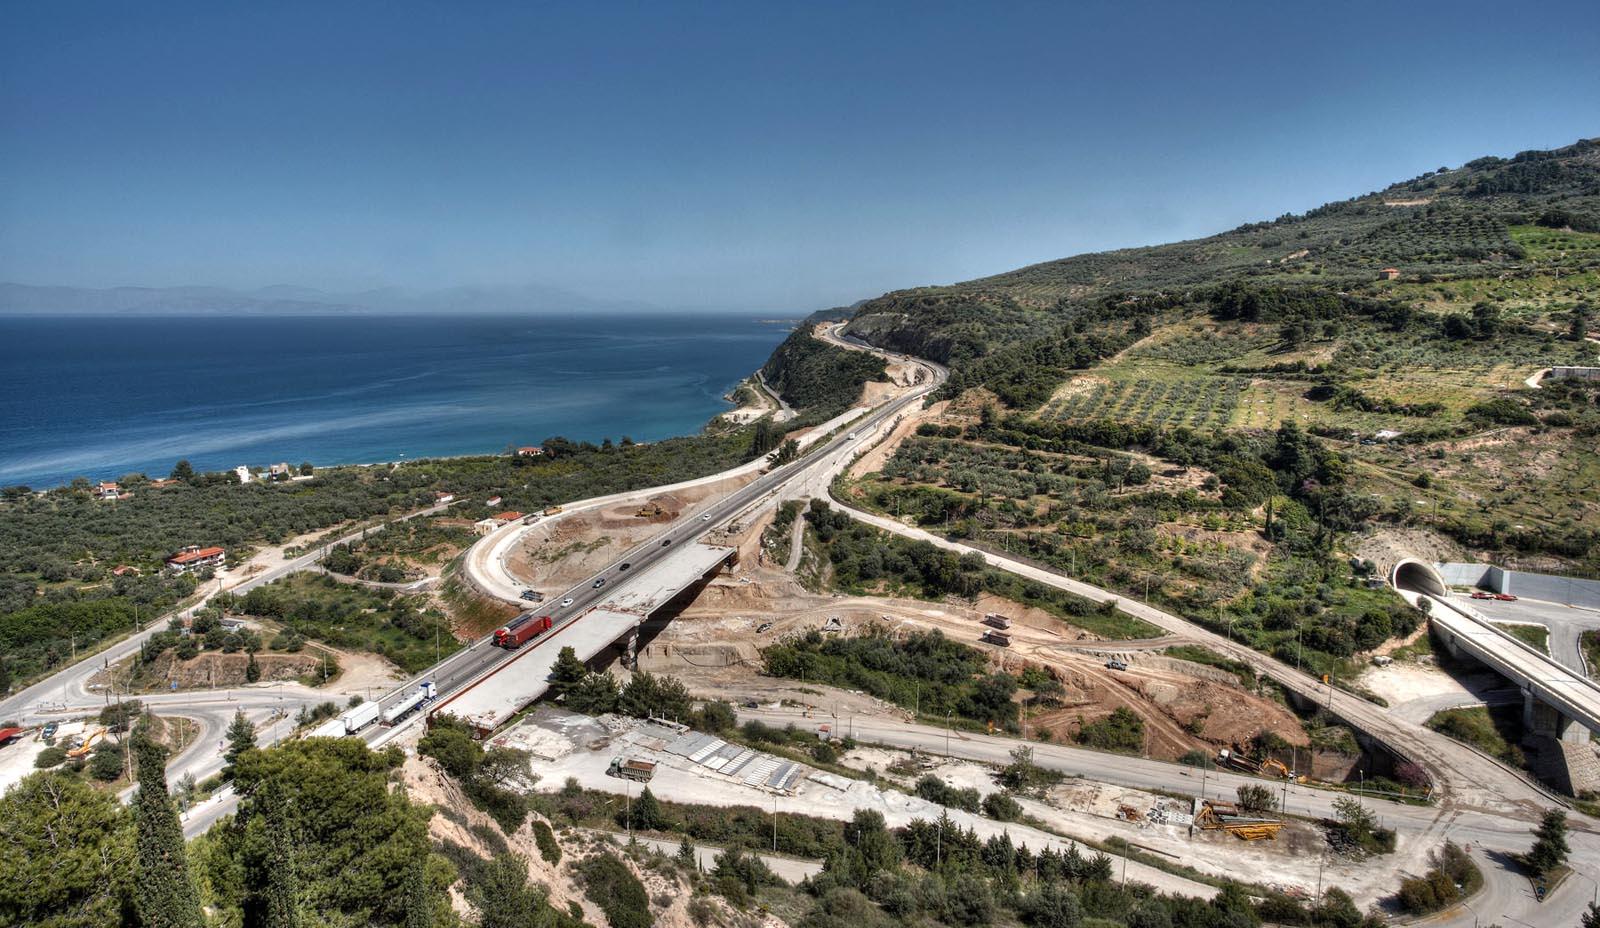 Photo of Πόσο κοστίζει η κατασκευή ενός χιλιόμετρου αυτοκινητόδρομου;